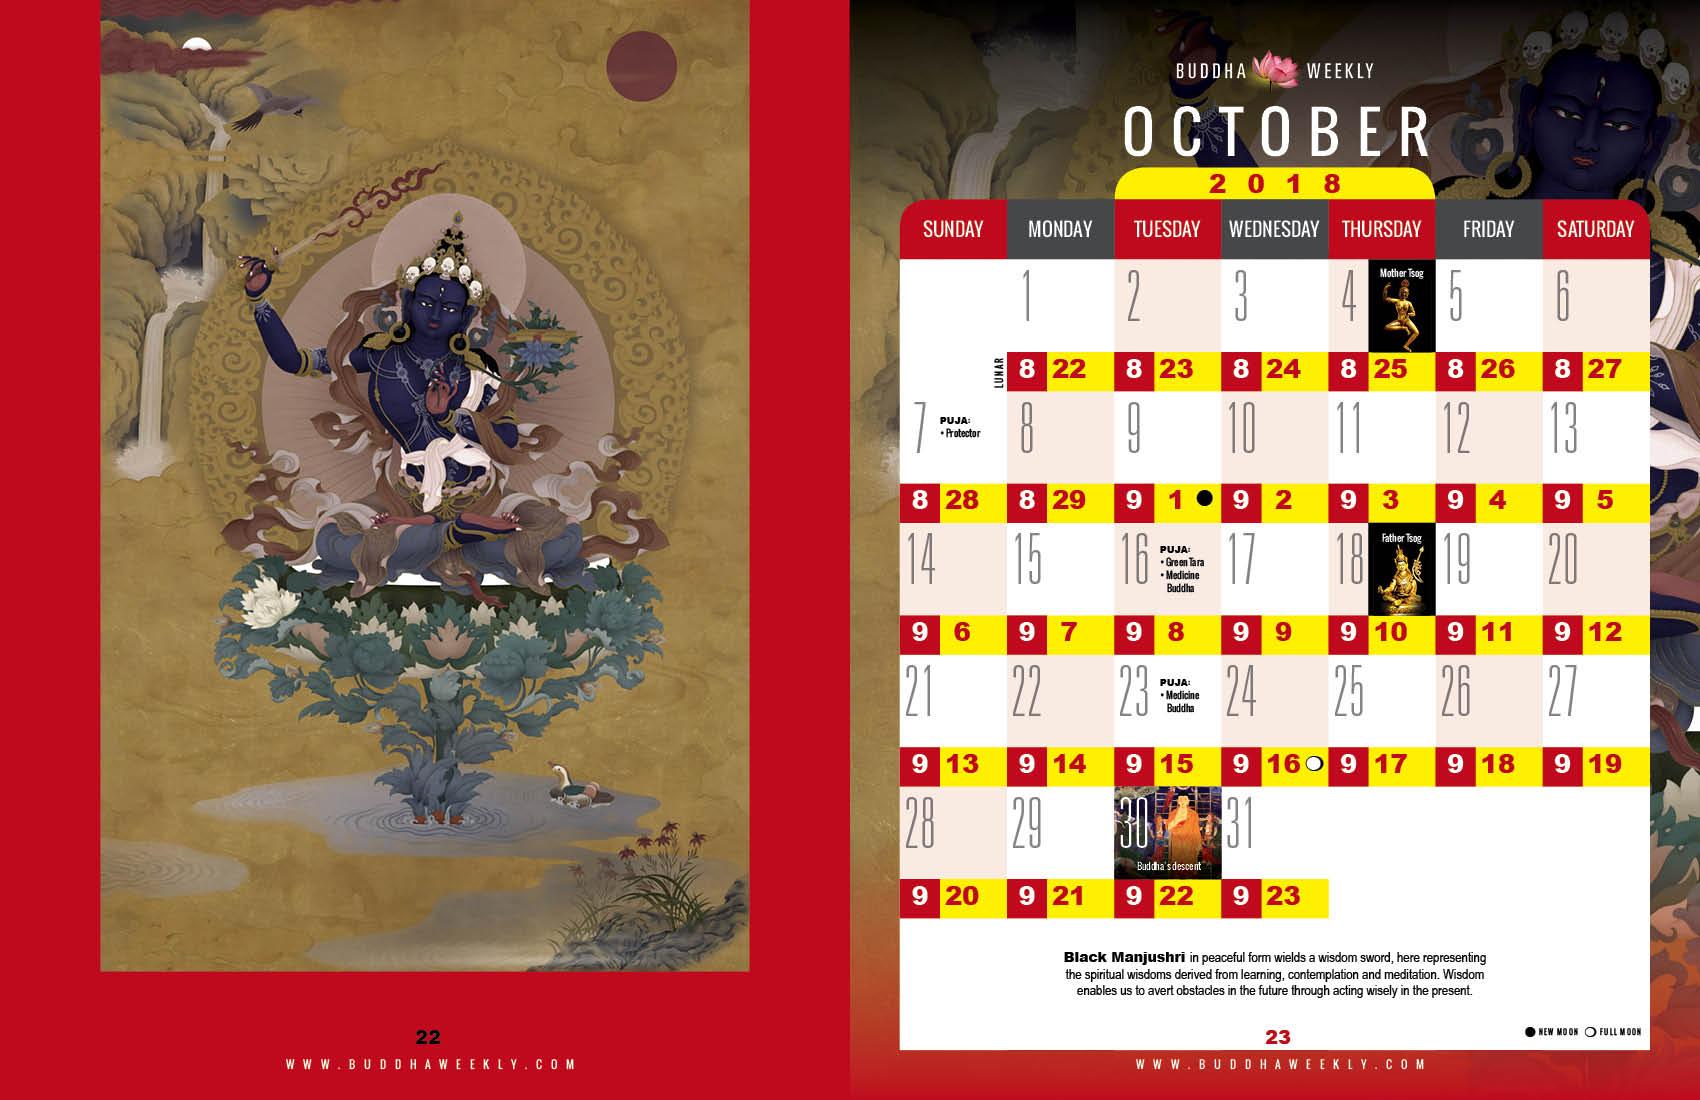 Lunar Calendar 2018 12 Buddha Weekly 10 October low 10